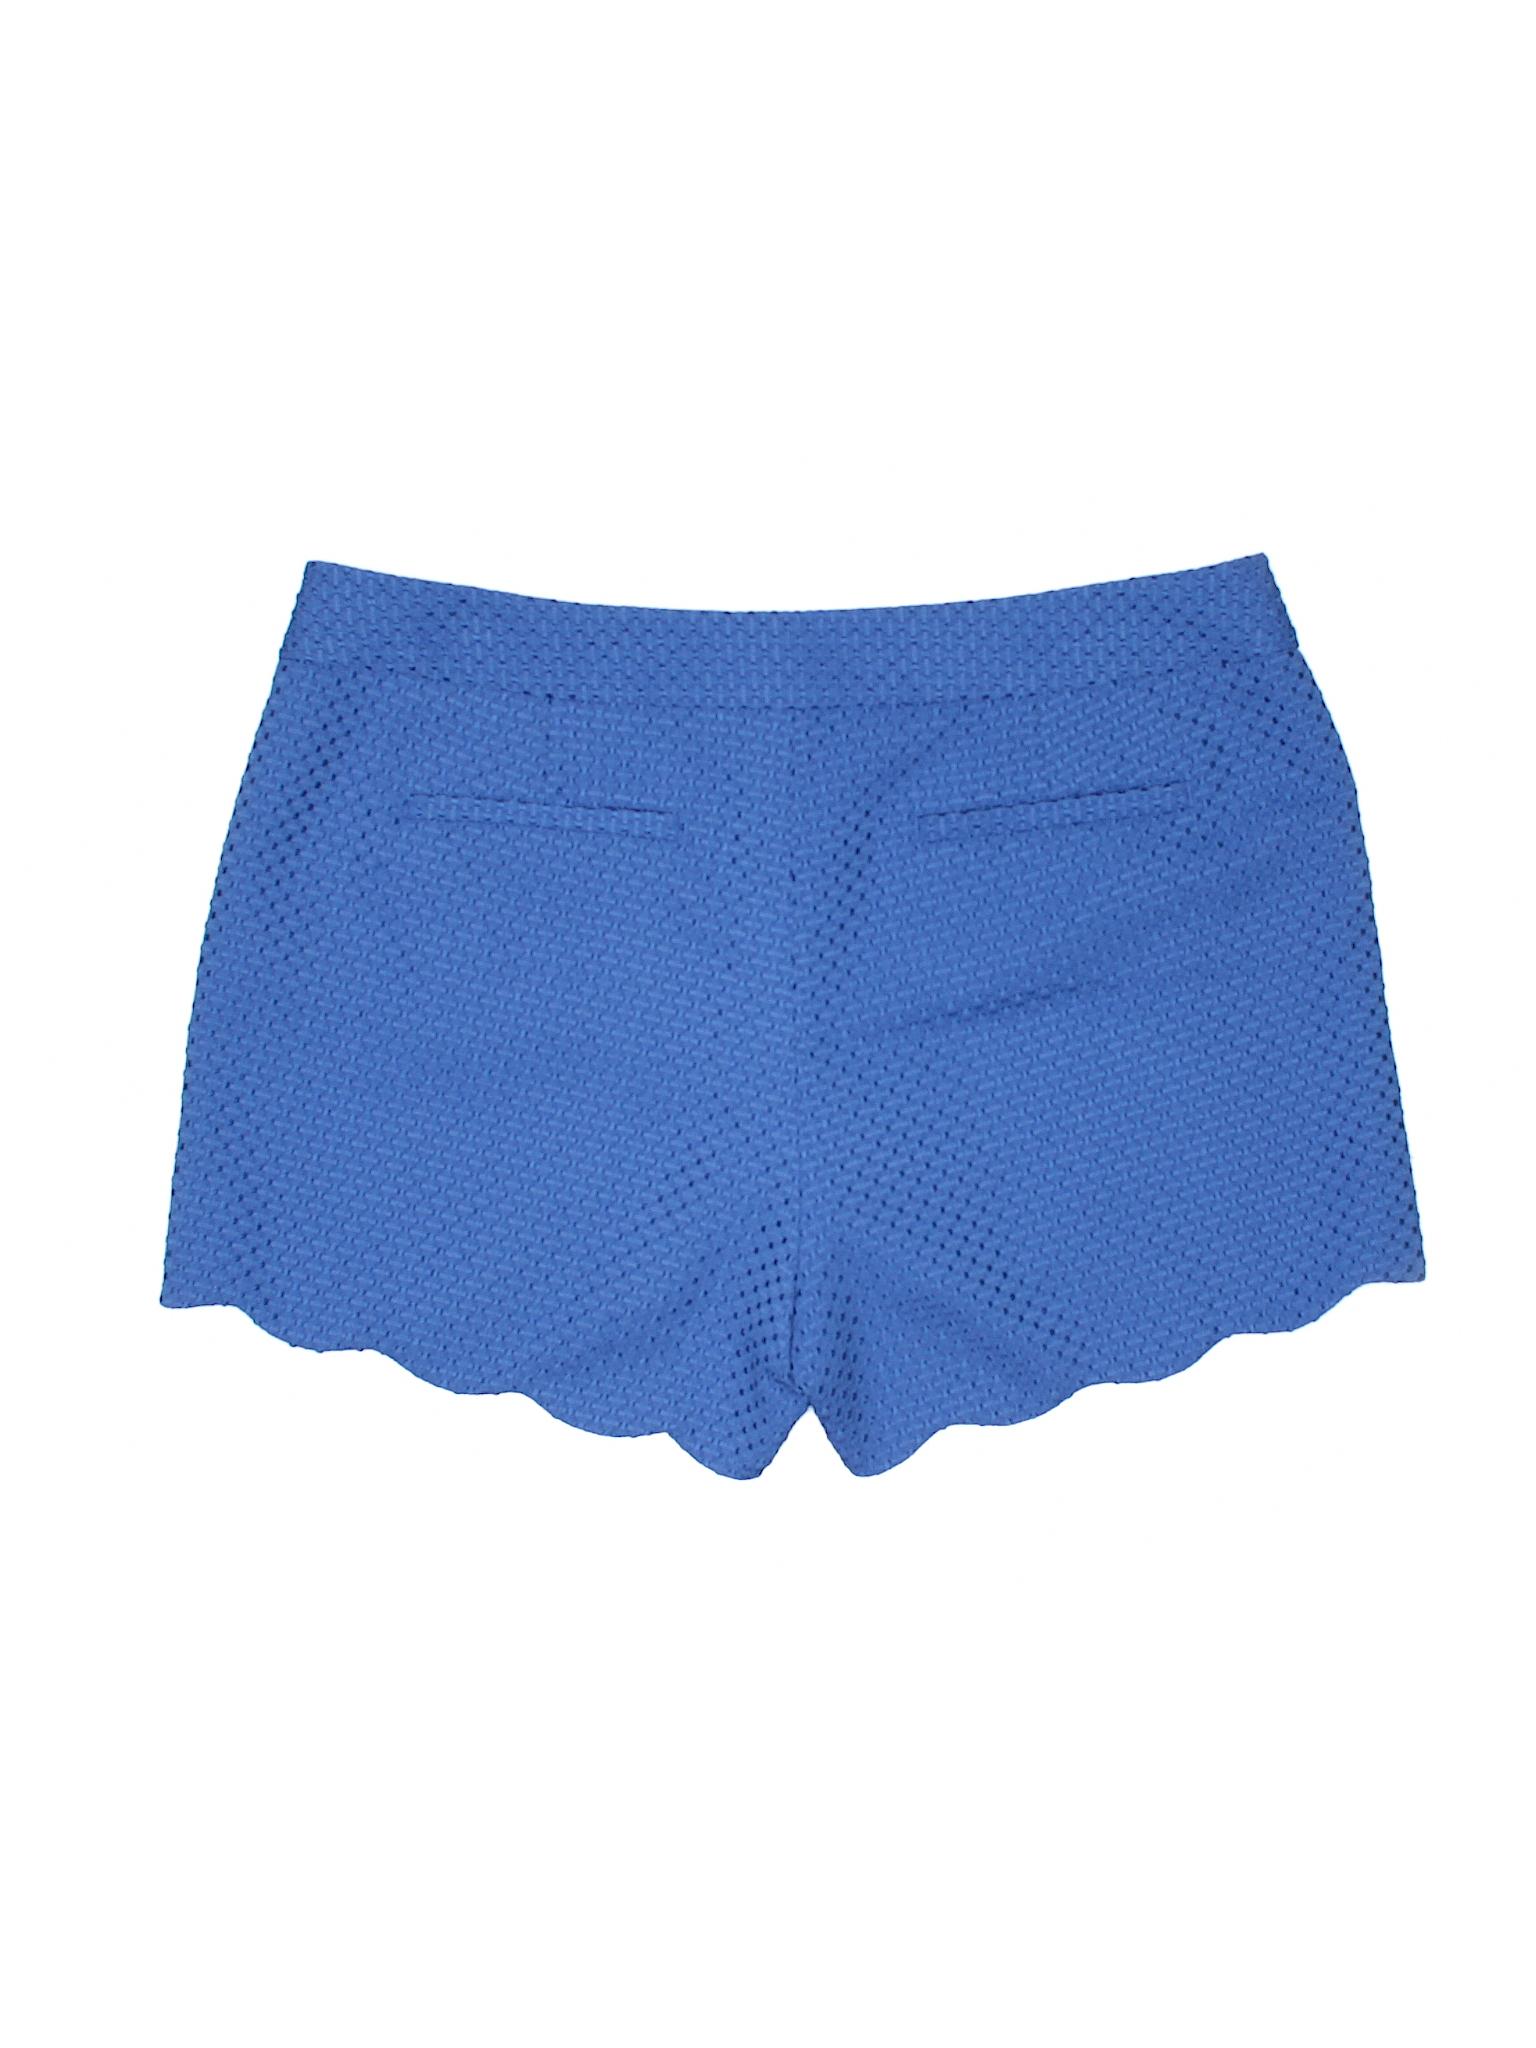 Boutique Boutique Elle Elle Shorts Shorts Elle Boutique Boutique Shorts Boutique Shorts Elle FAYpqAw